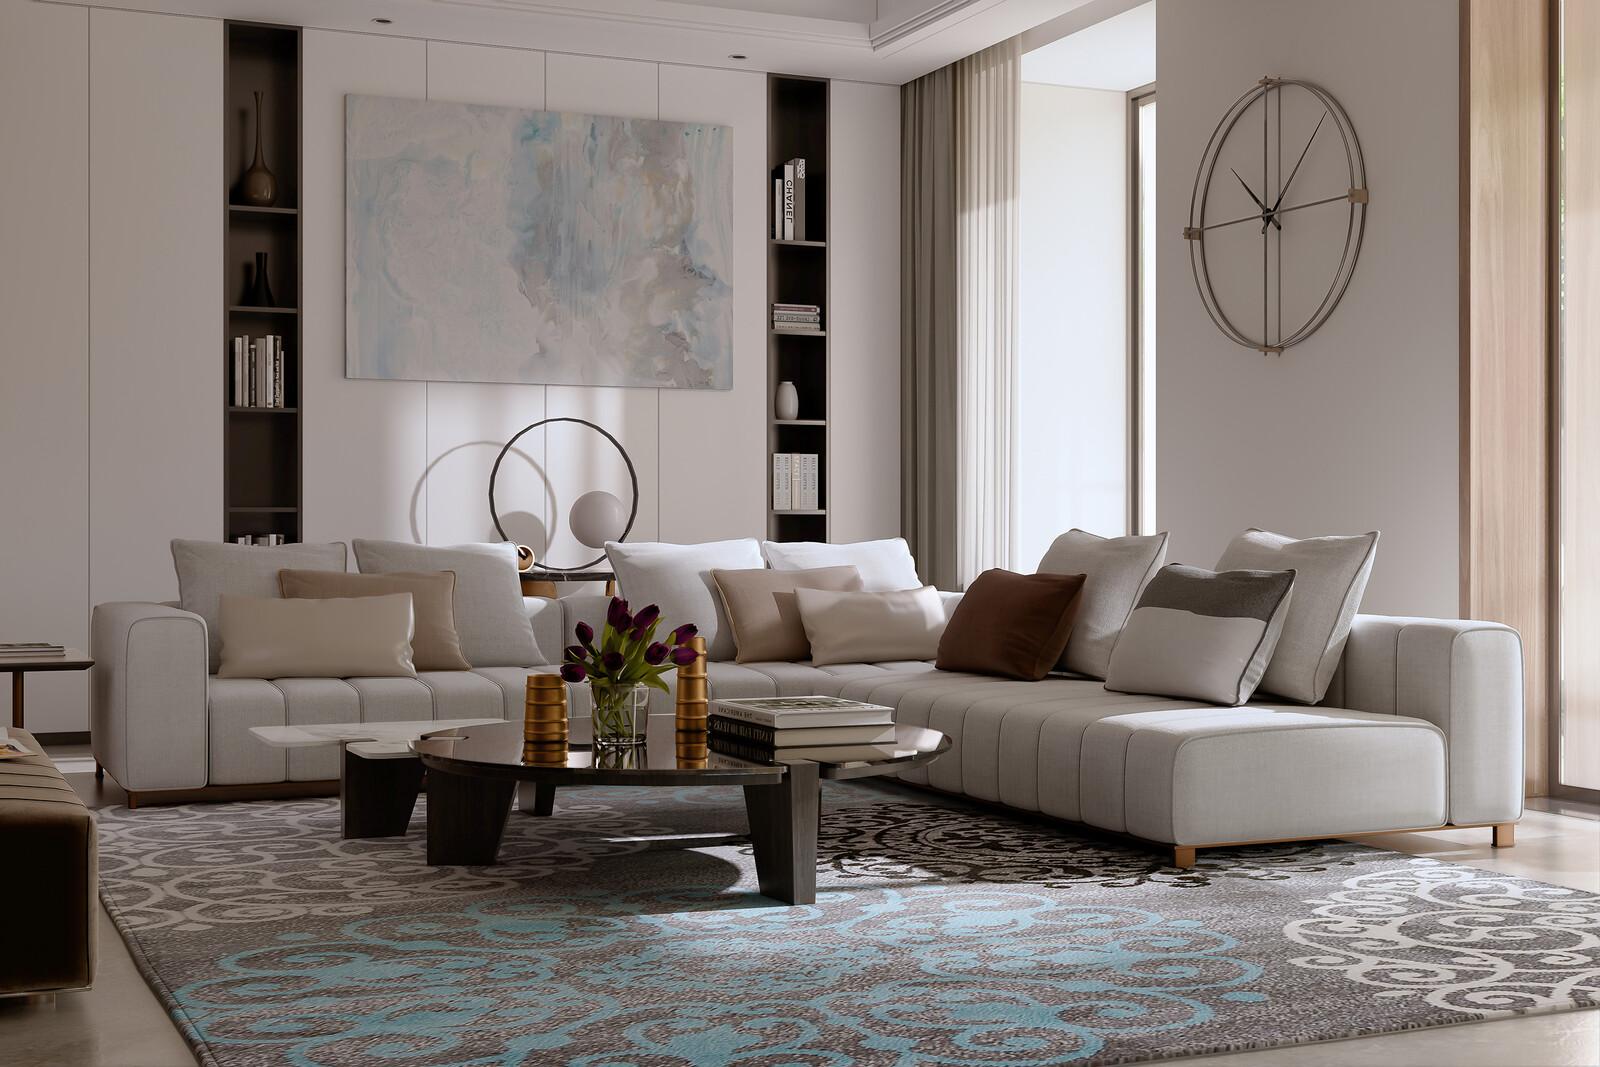 Living Room Light Study